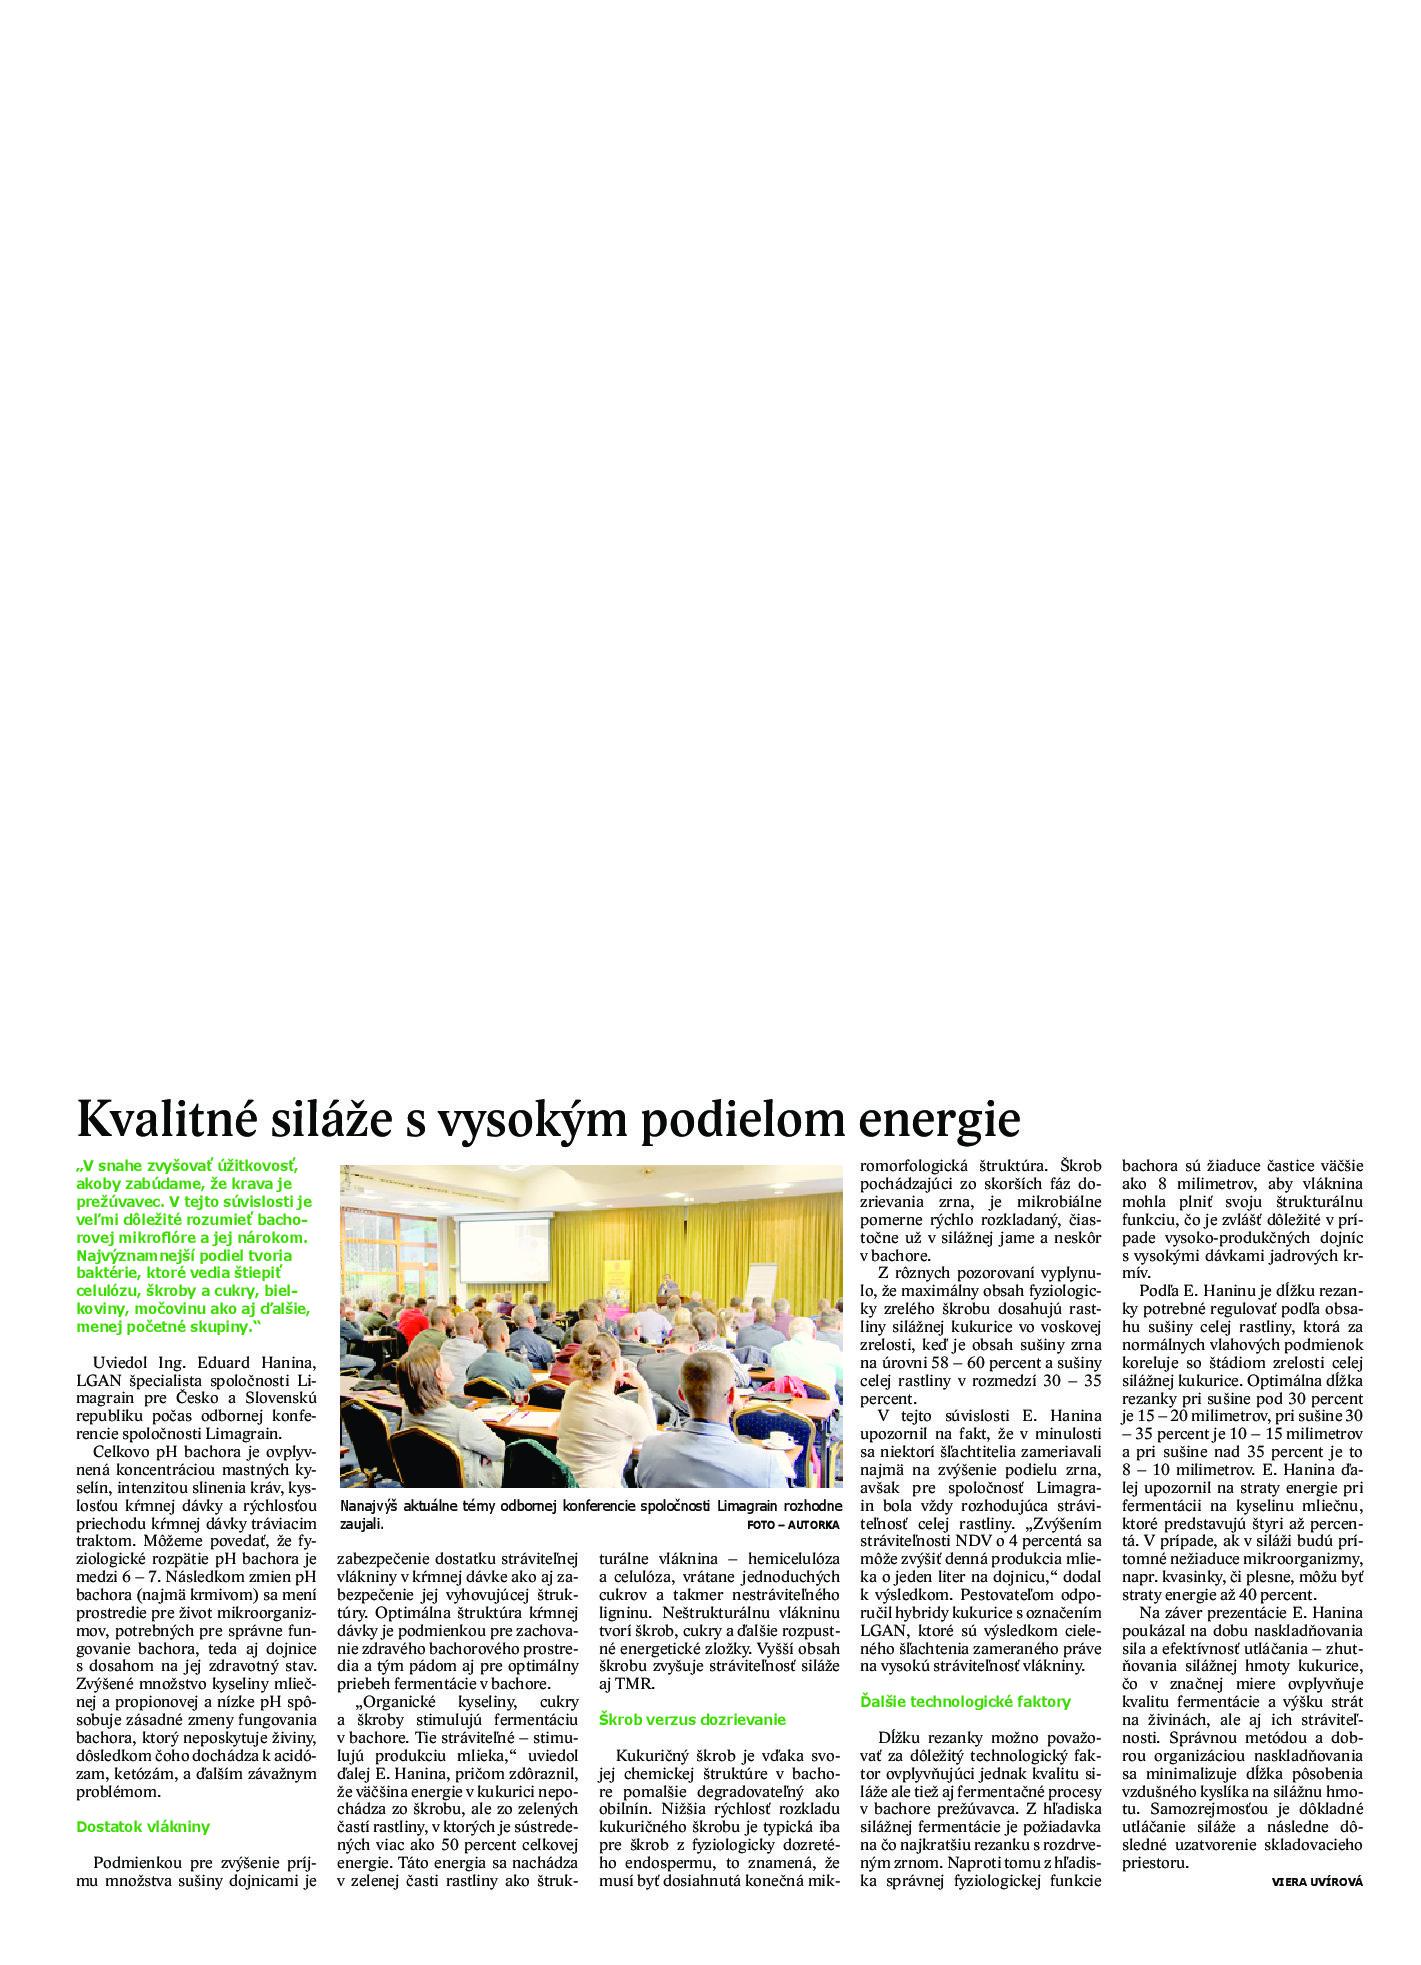 2019 SK red_LGAN konference_Vysoký podiel energie_RNA0_1127_020